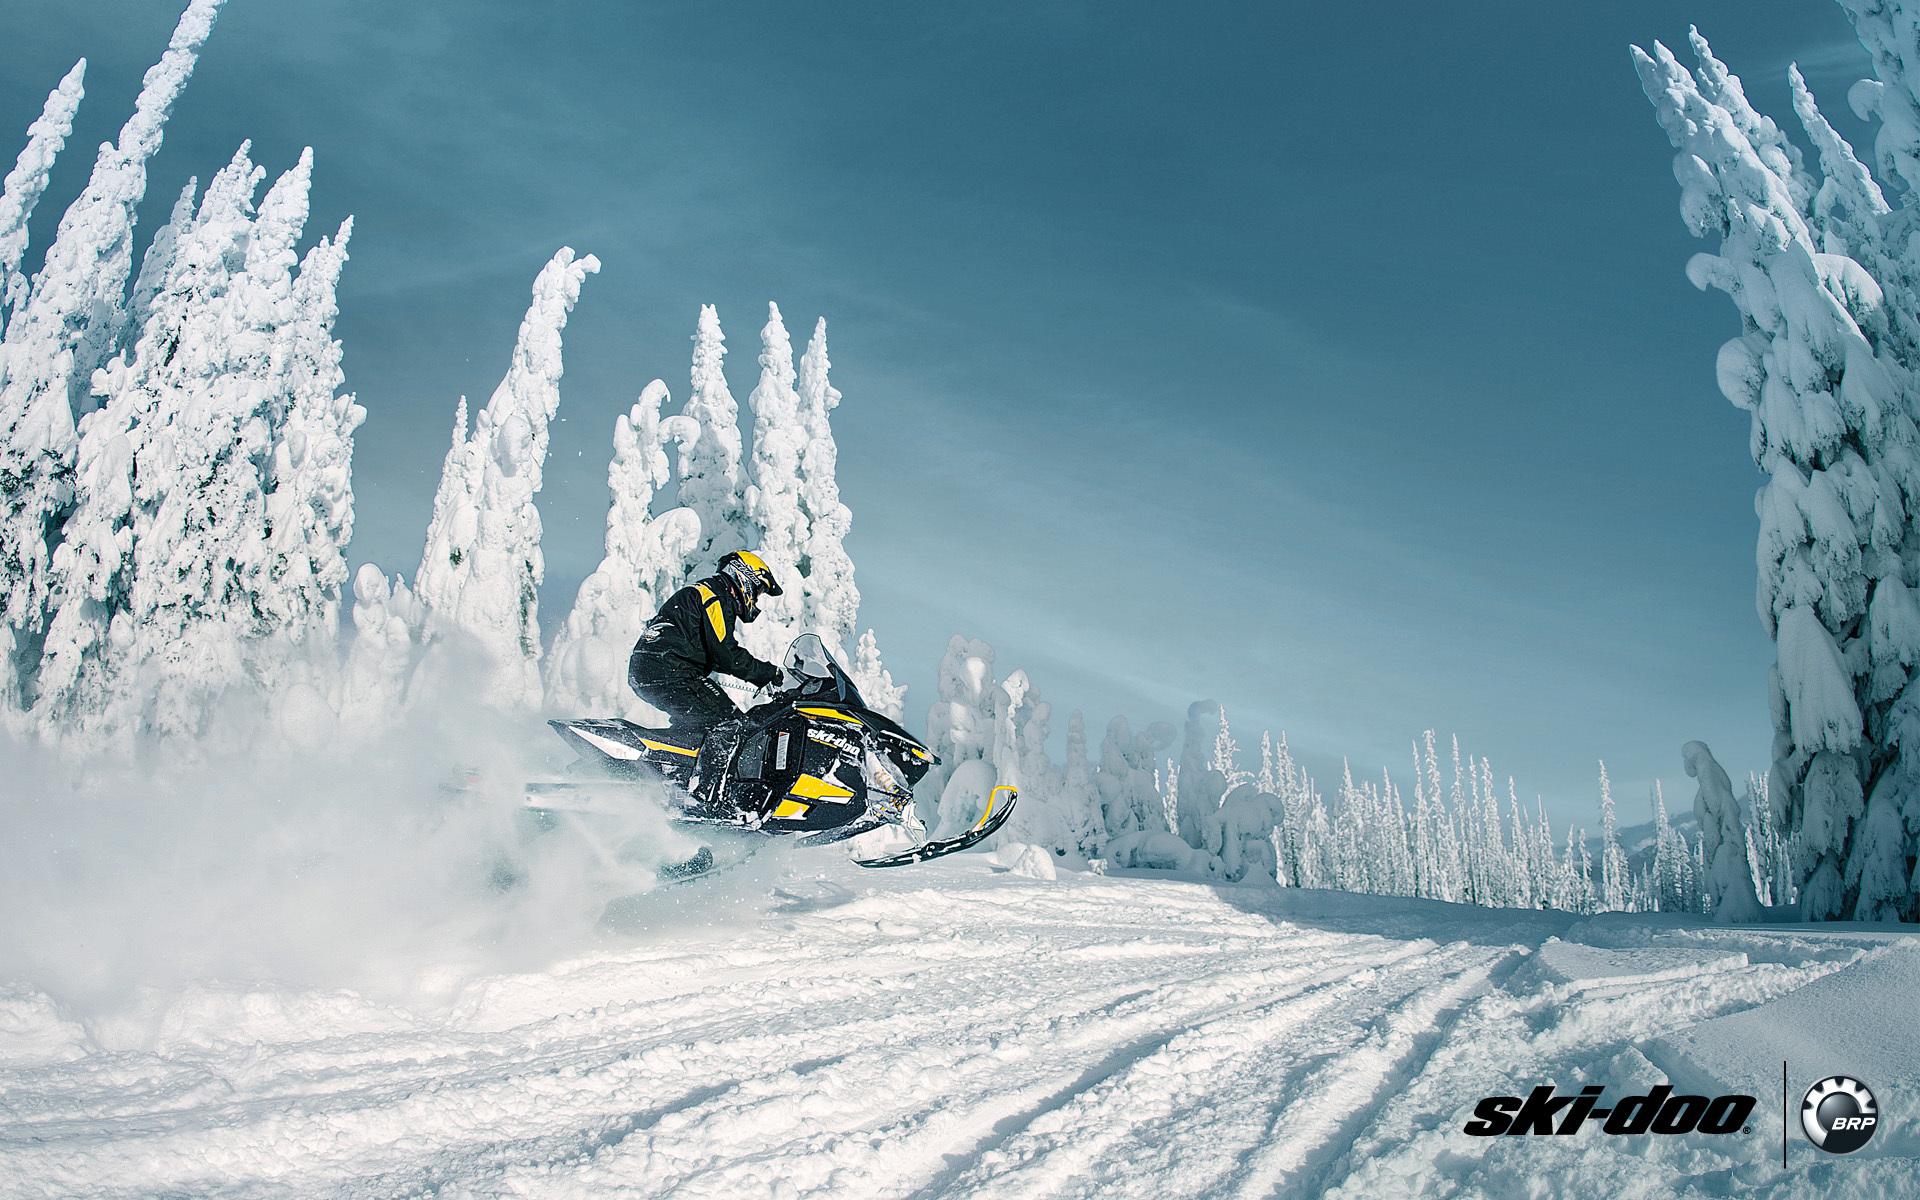 Ski doo skidoo renegade adrenaline snowmobile snowmobile brp 1680x1050